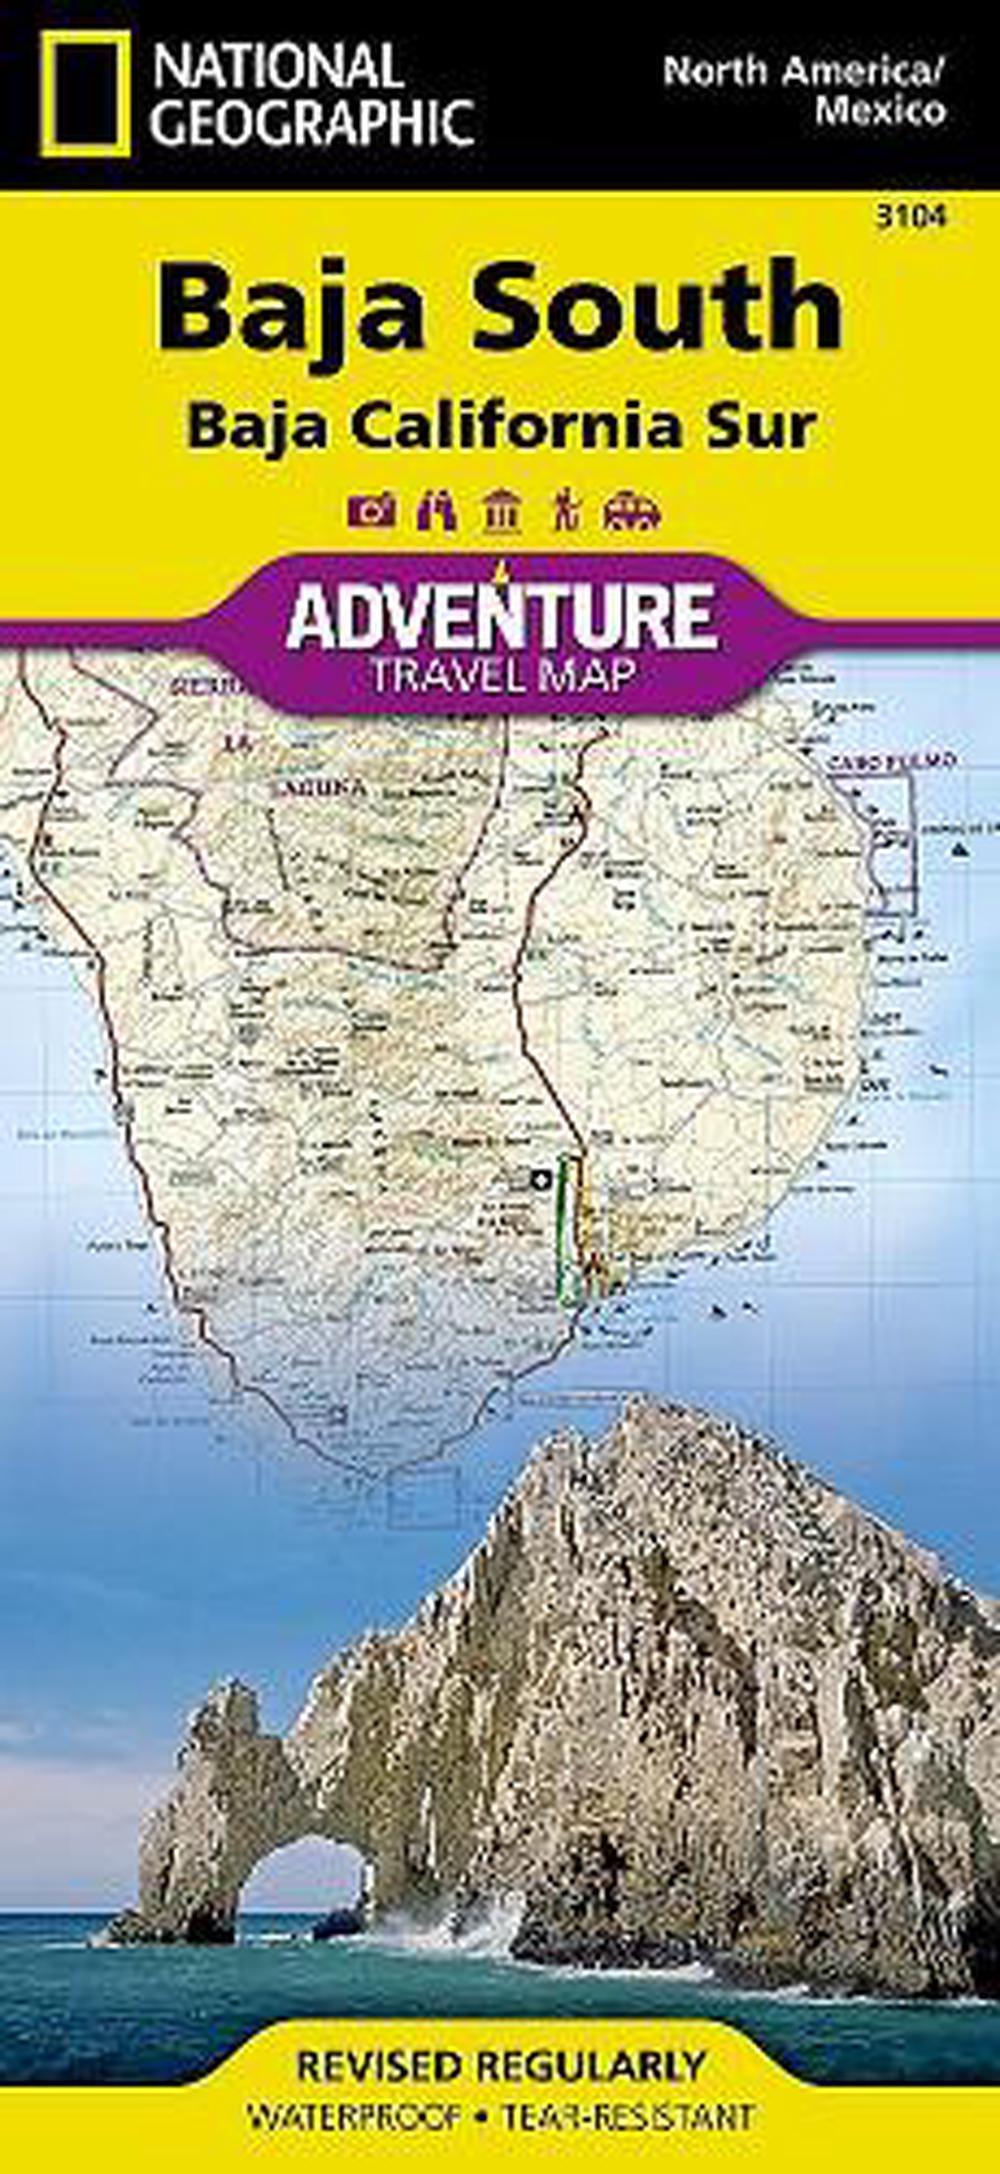 Baja South Baja California Sur Mexico Travel Maps International